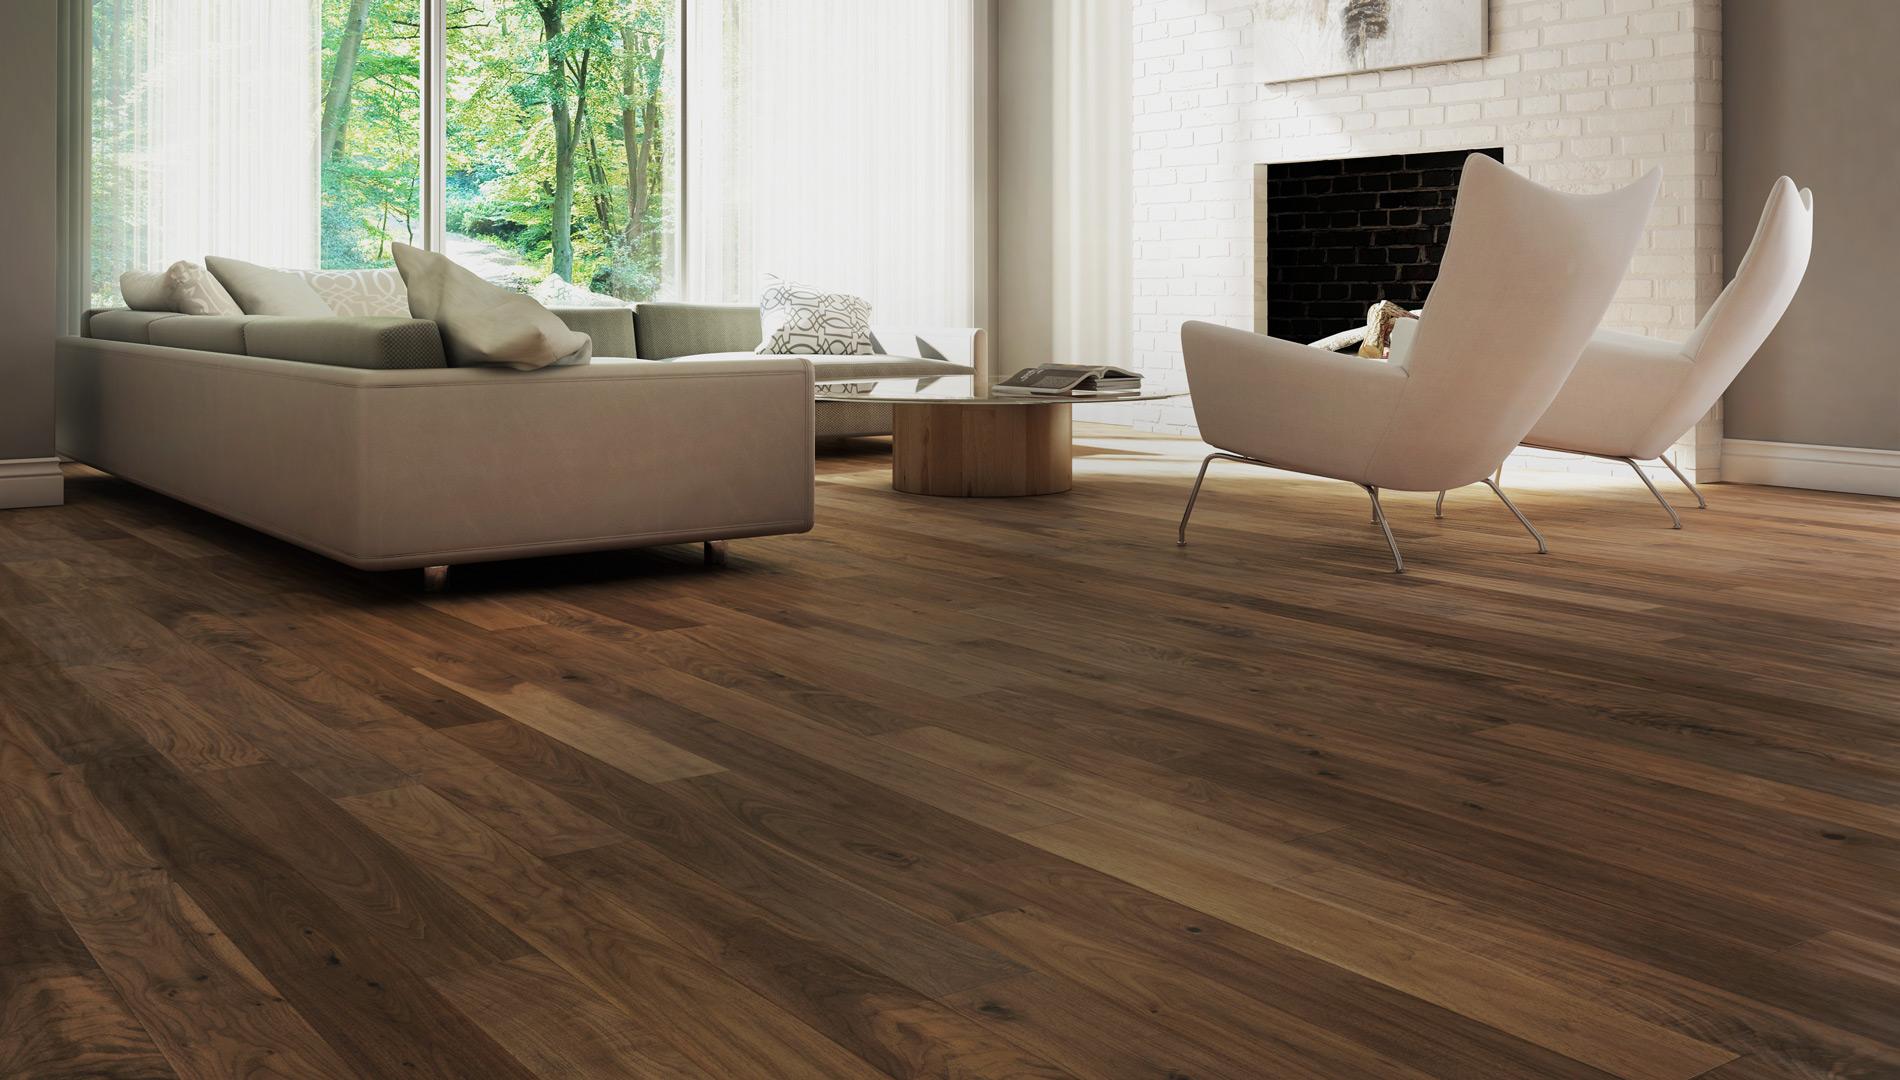 Fullsize Of Walnut Hardwood Flooring